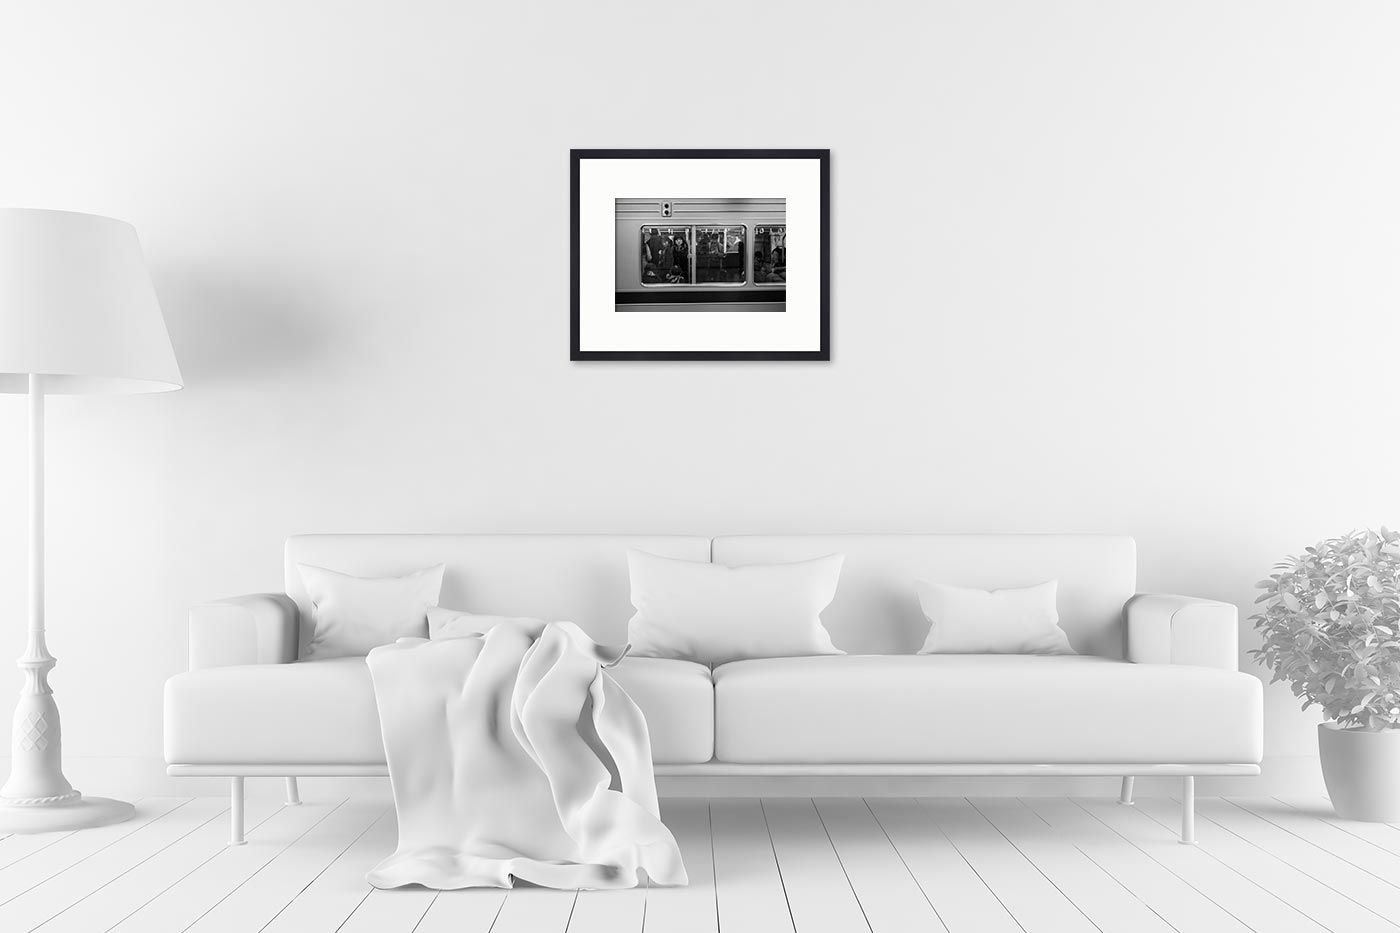 Cadre galerie 40x50 7 PM